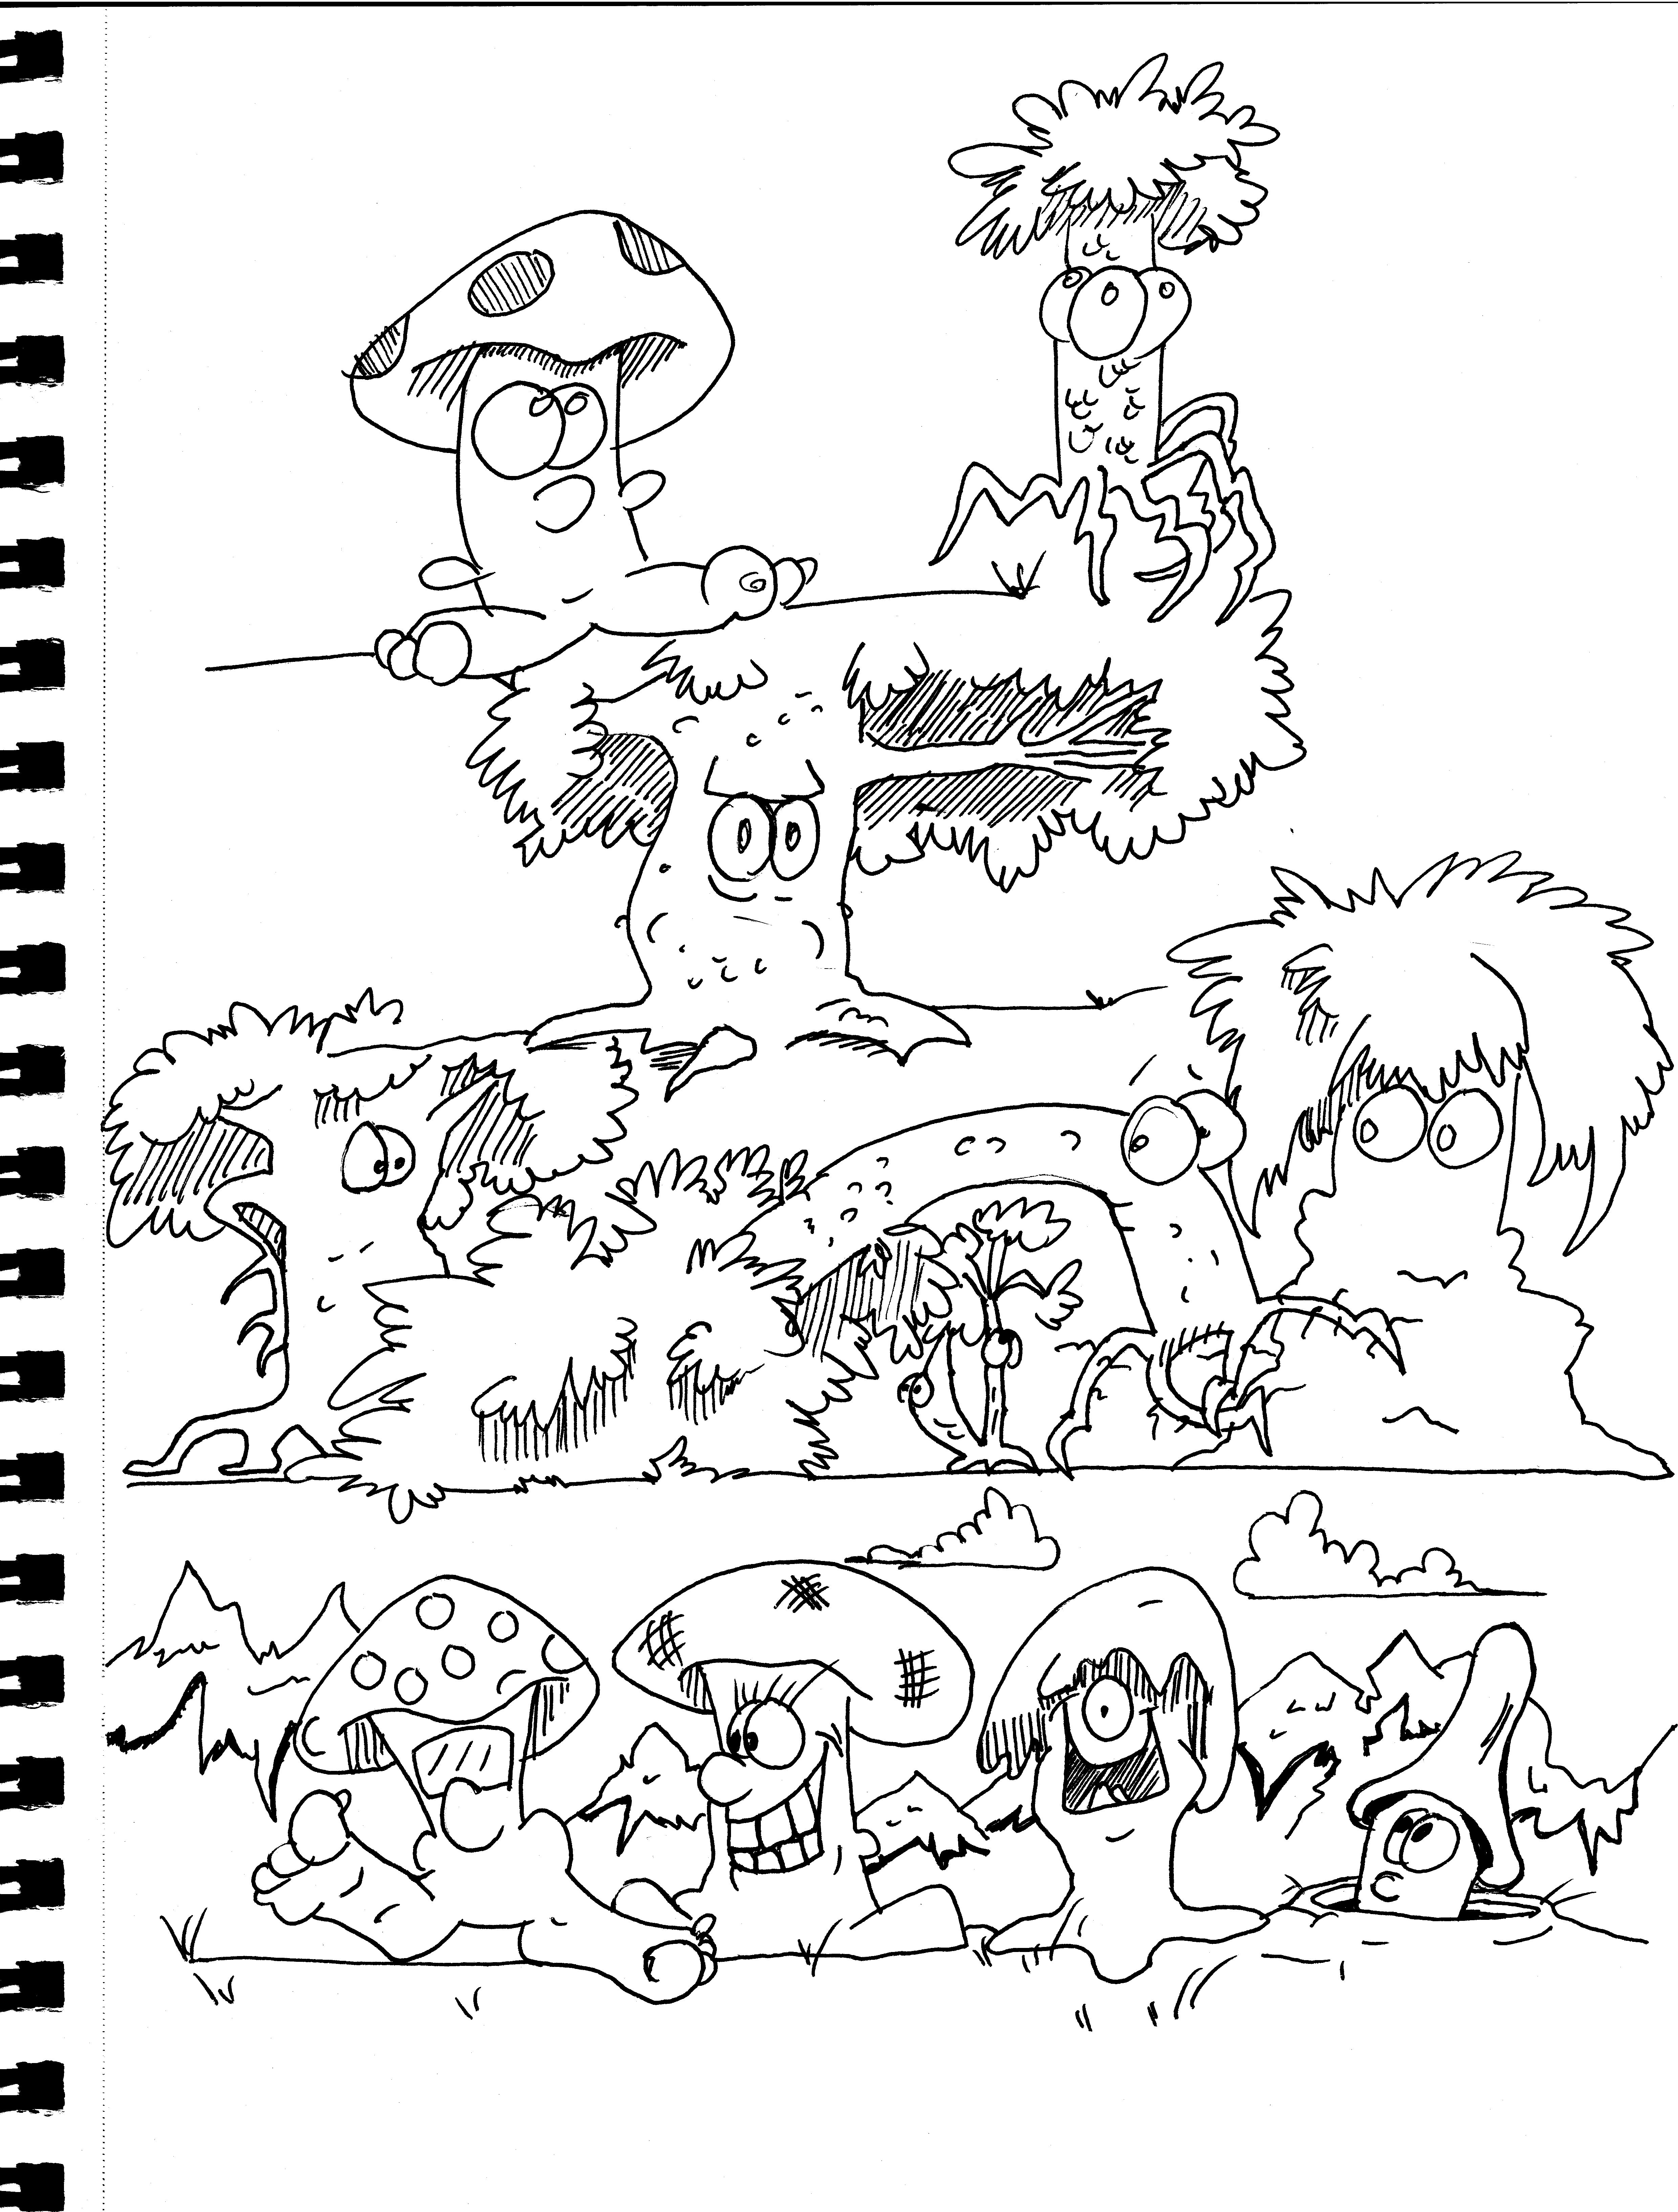 4956x6534 Mushrooms, Trees That Look Lsd Inspired Doodles, Boon, Cartoons